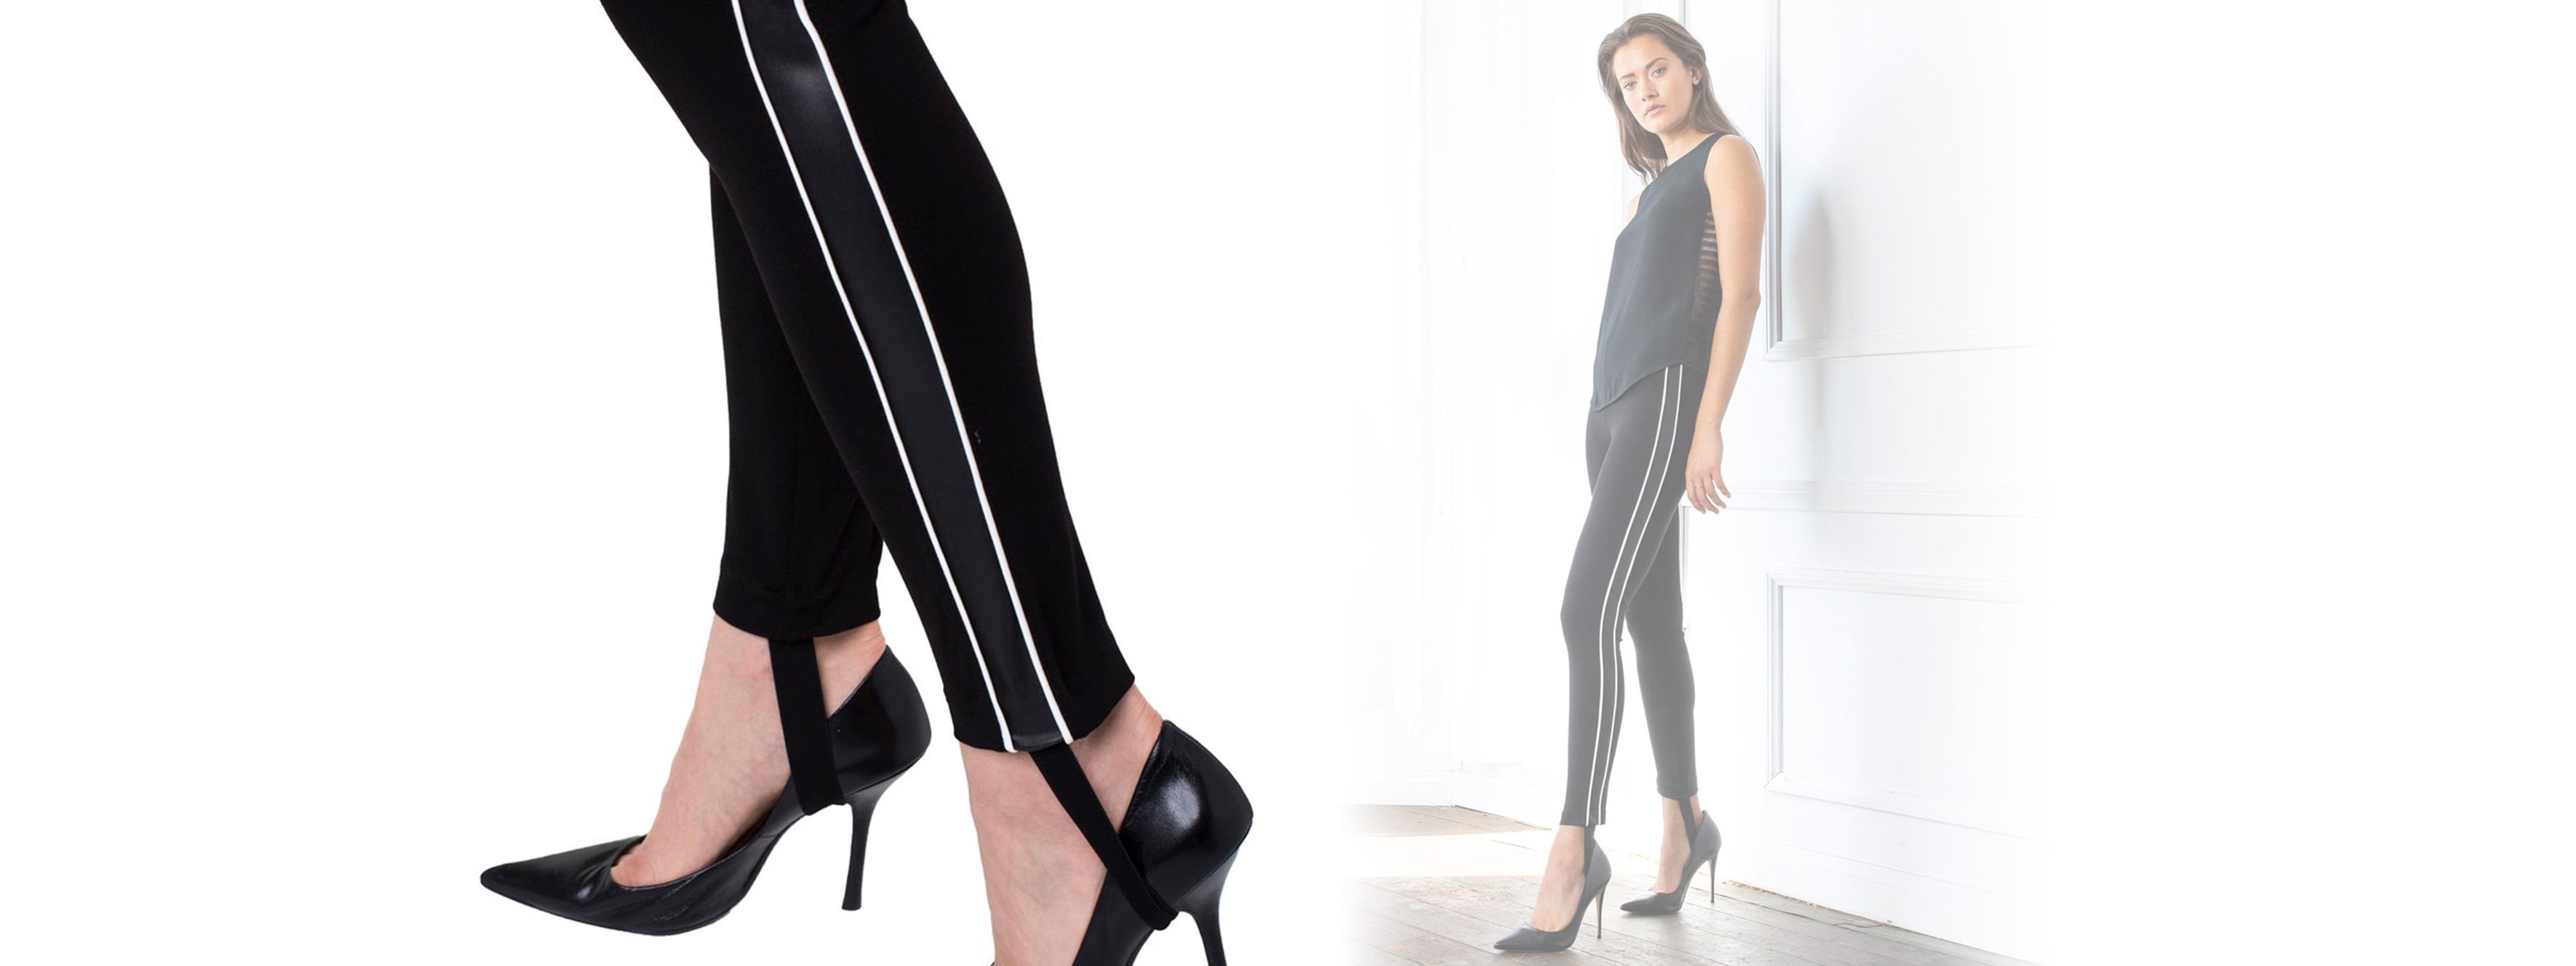 knuths-liverpooljeans-drew-ankle-legging-stirrup